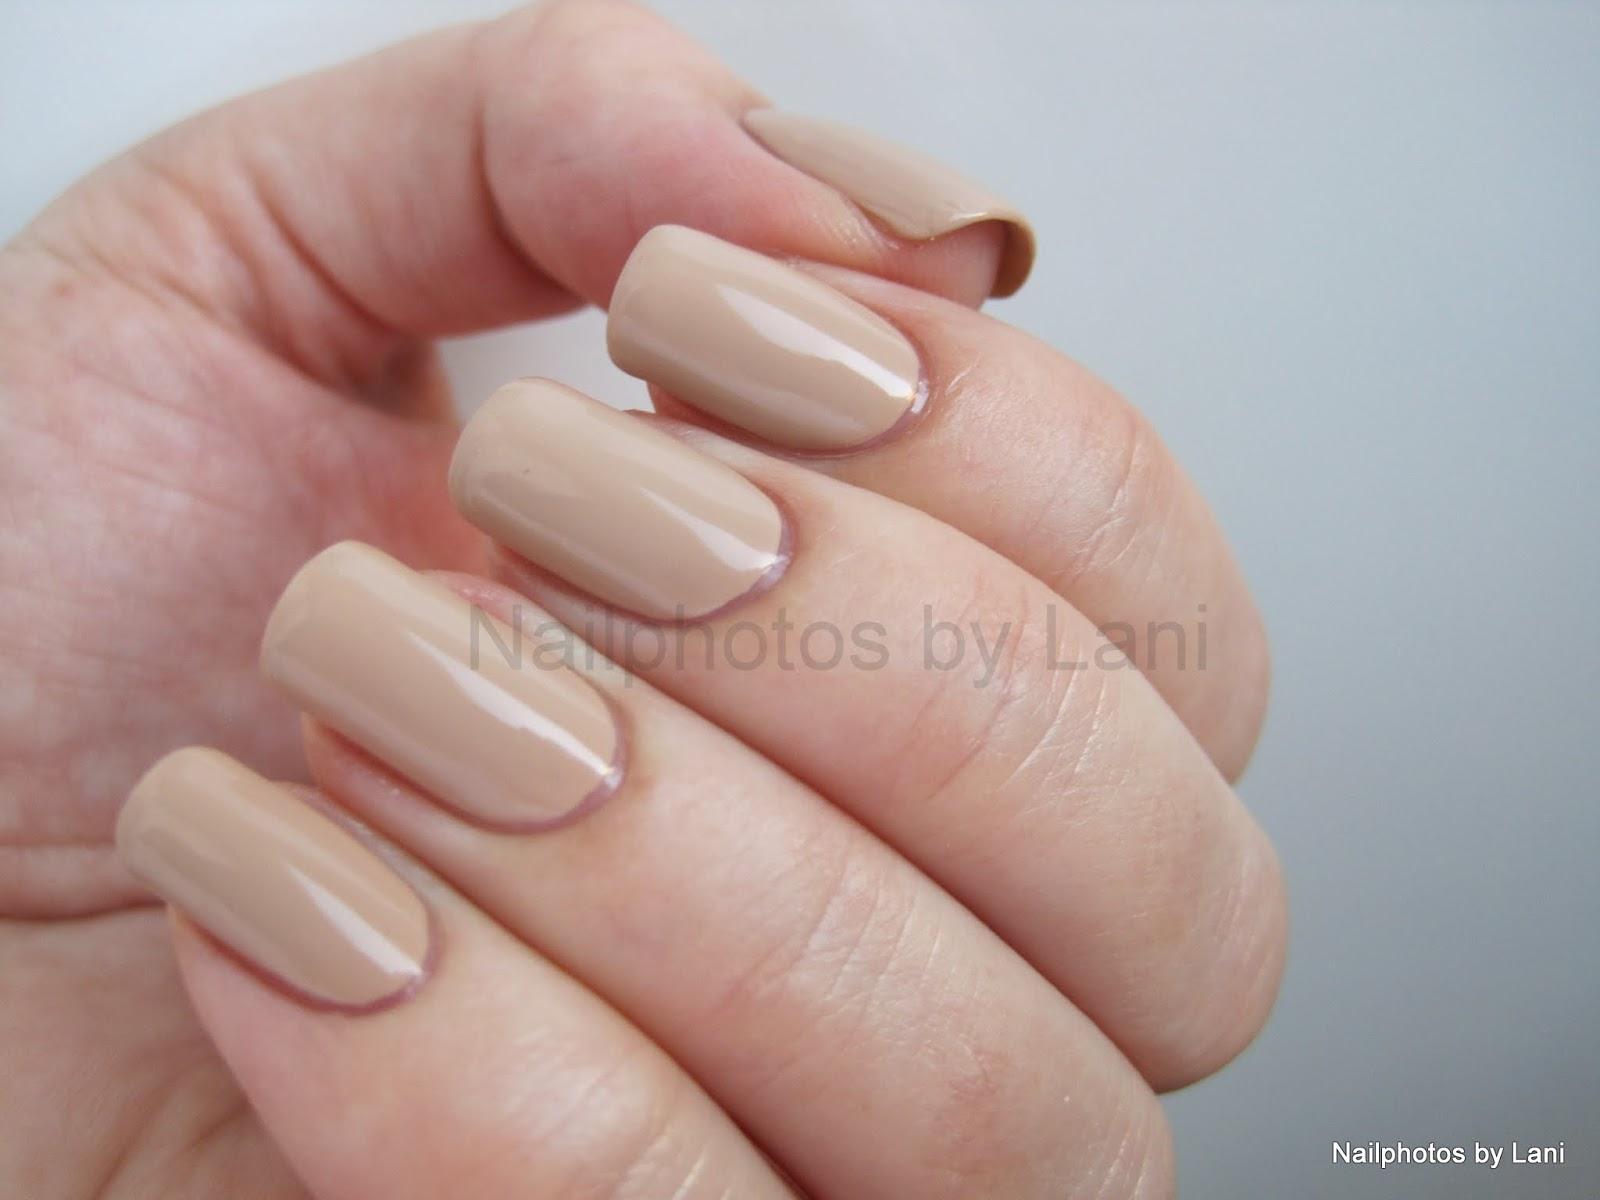 Opi Matte Collection Nail Polish